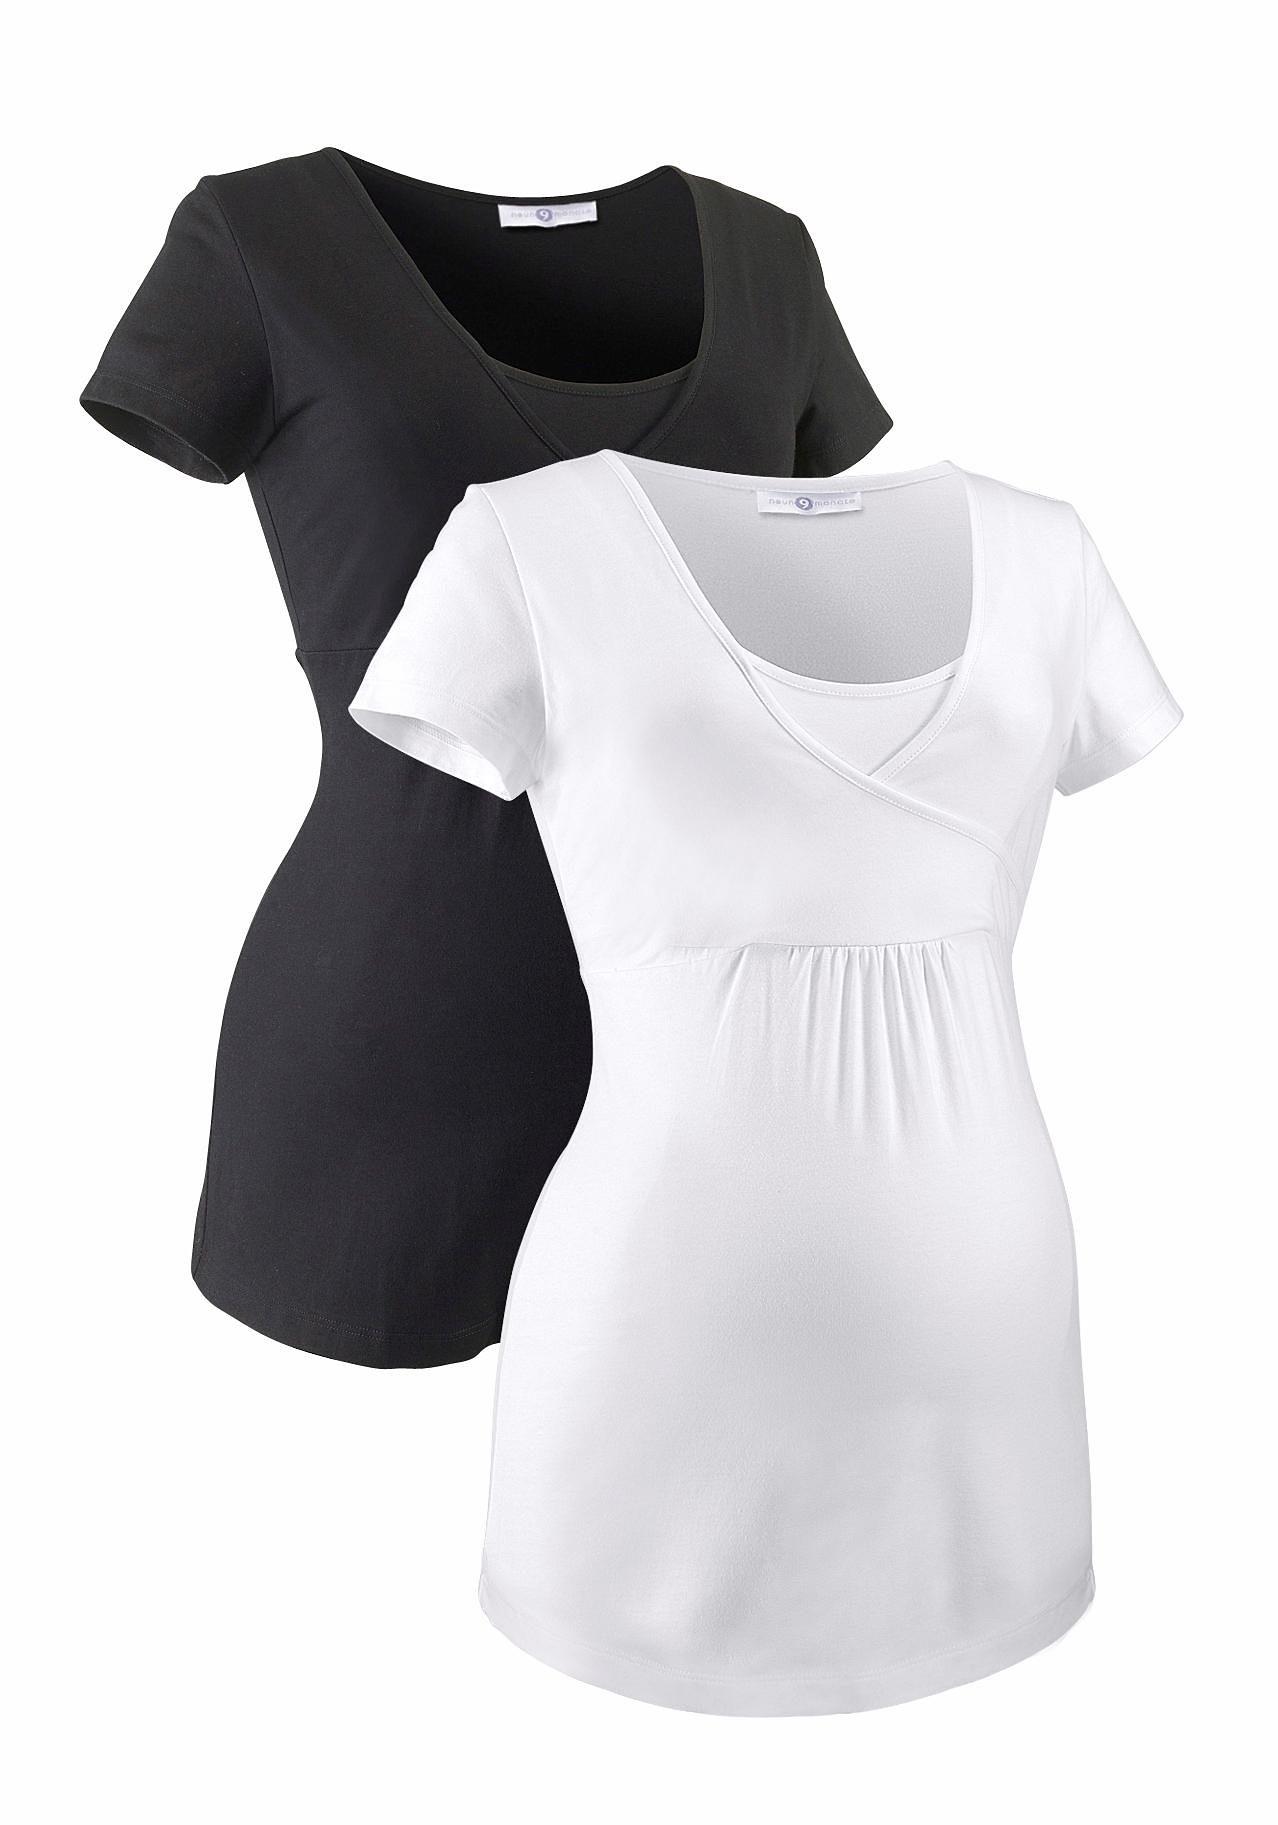 Neun Monate Umstandsshirt (Packung 2 tlg) | Bekleidung > Umstandsmode > Umstandsshirts | Schwarz | Neun Monate